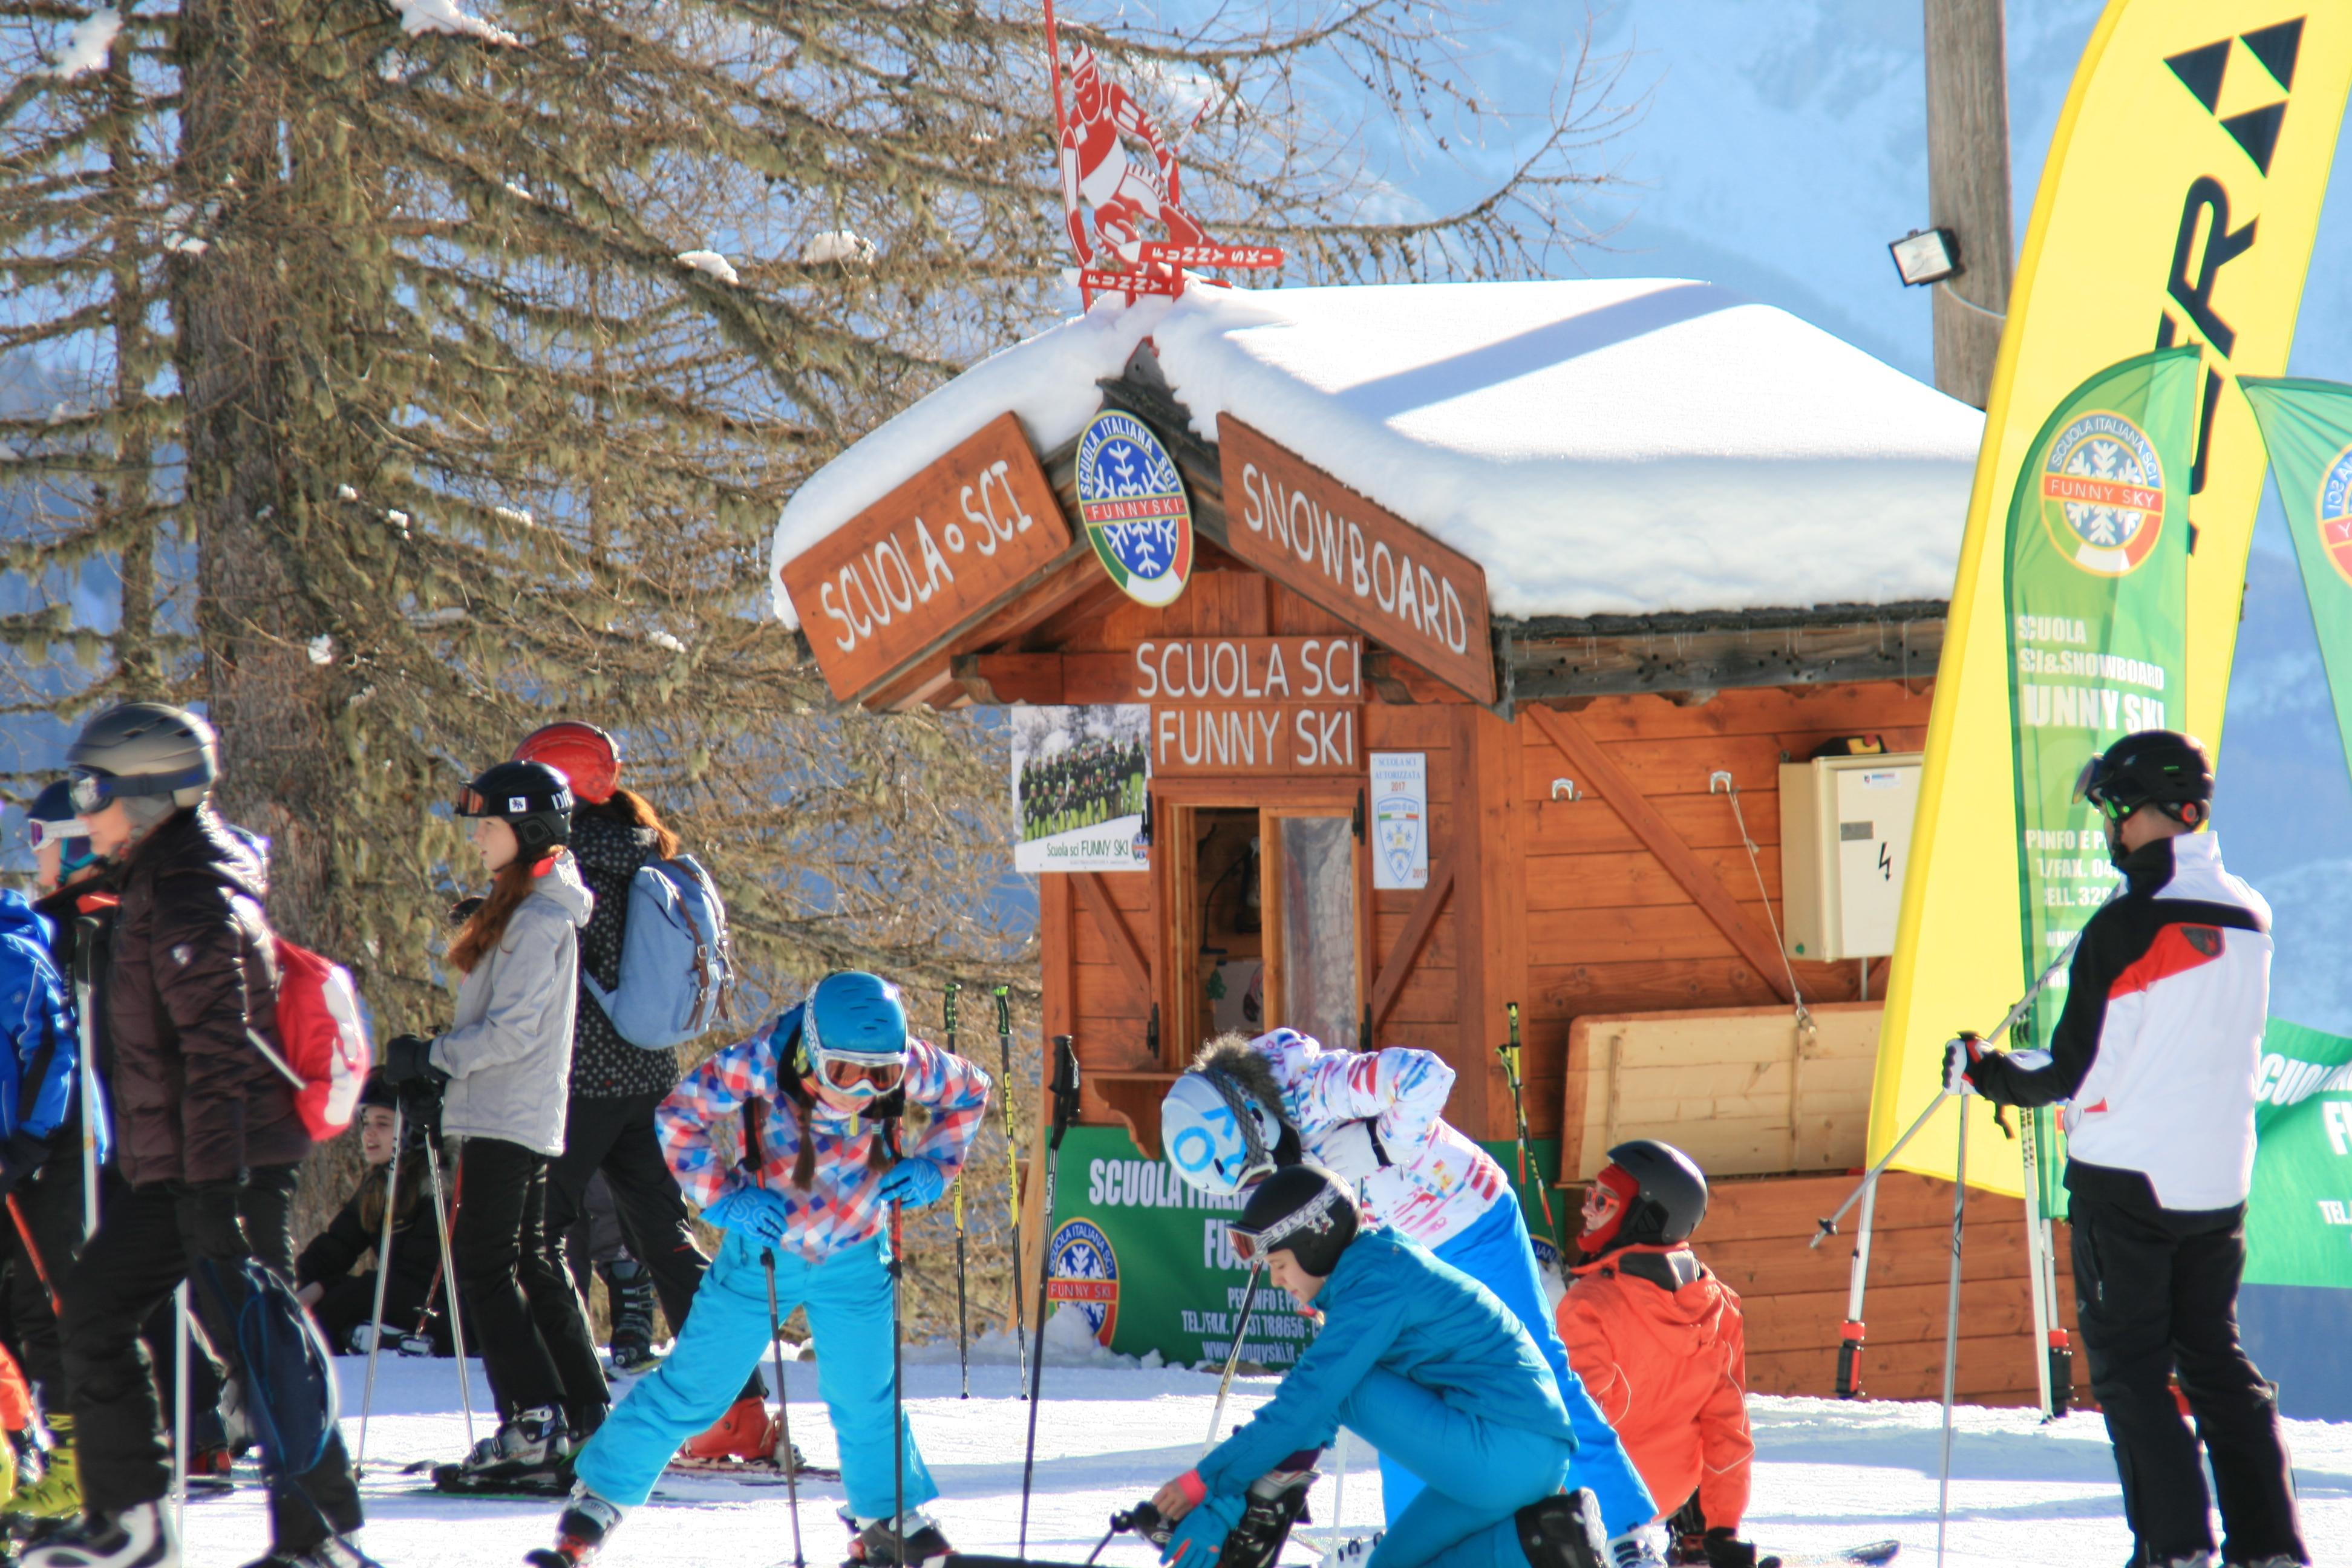 scuola sci funny ski